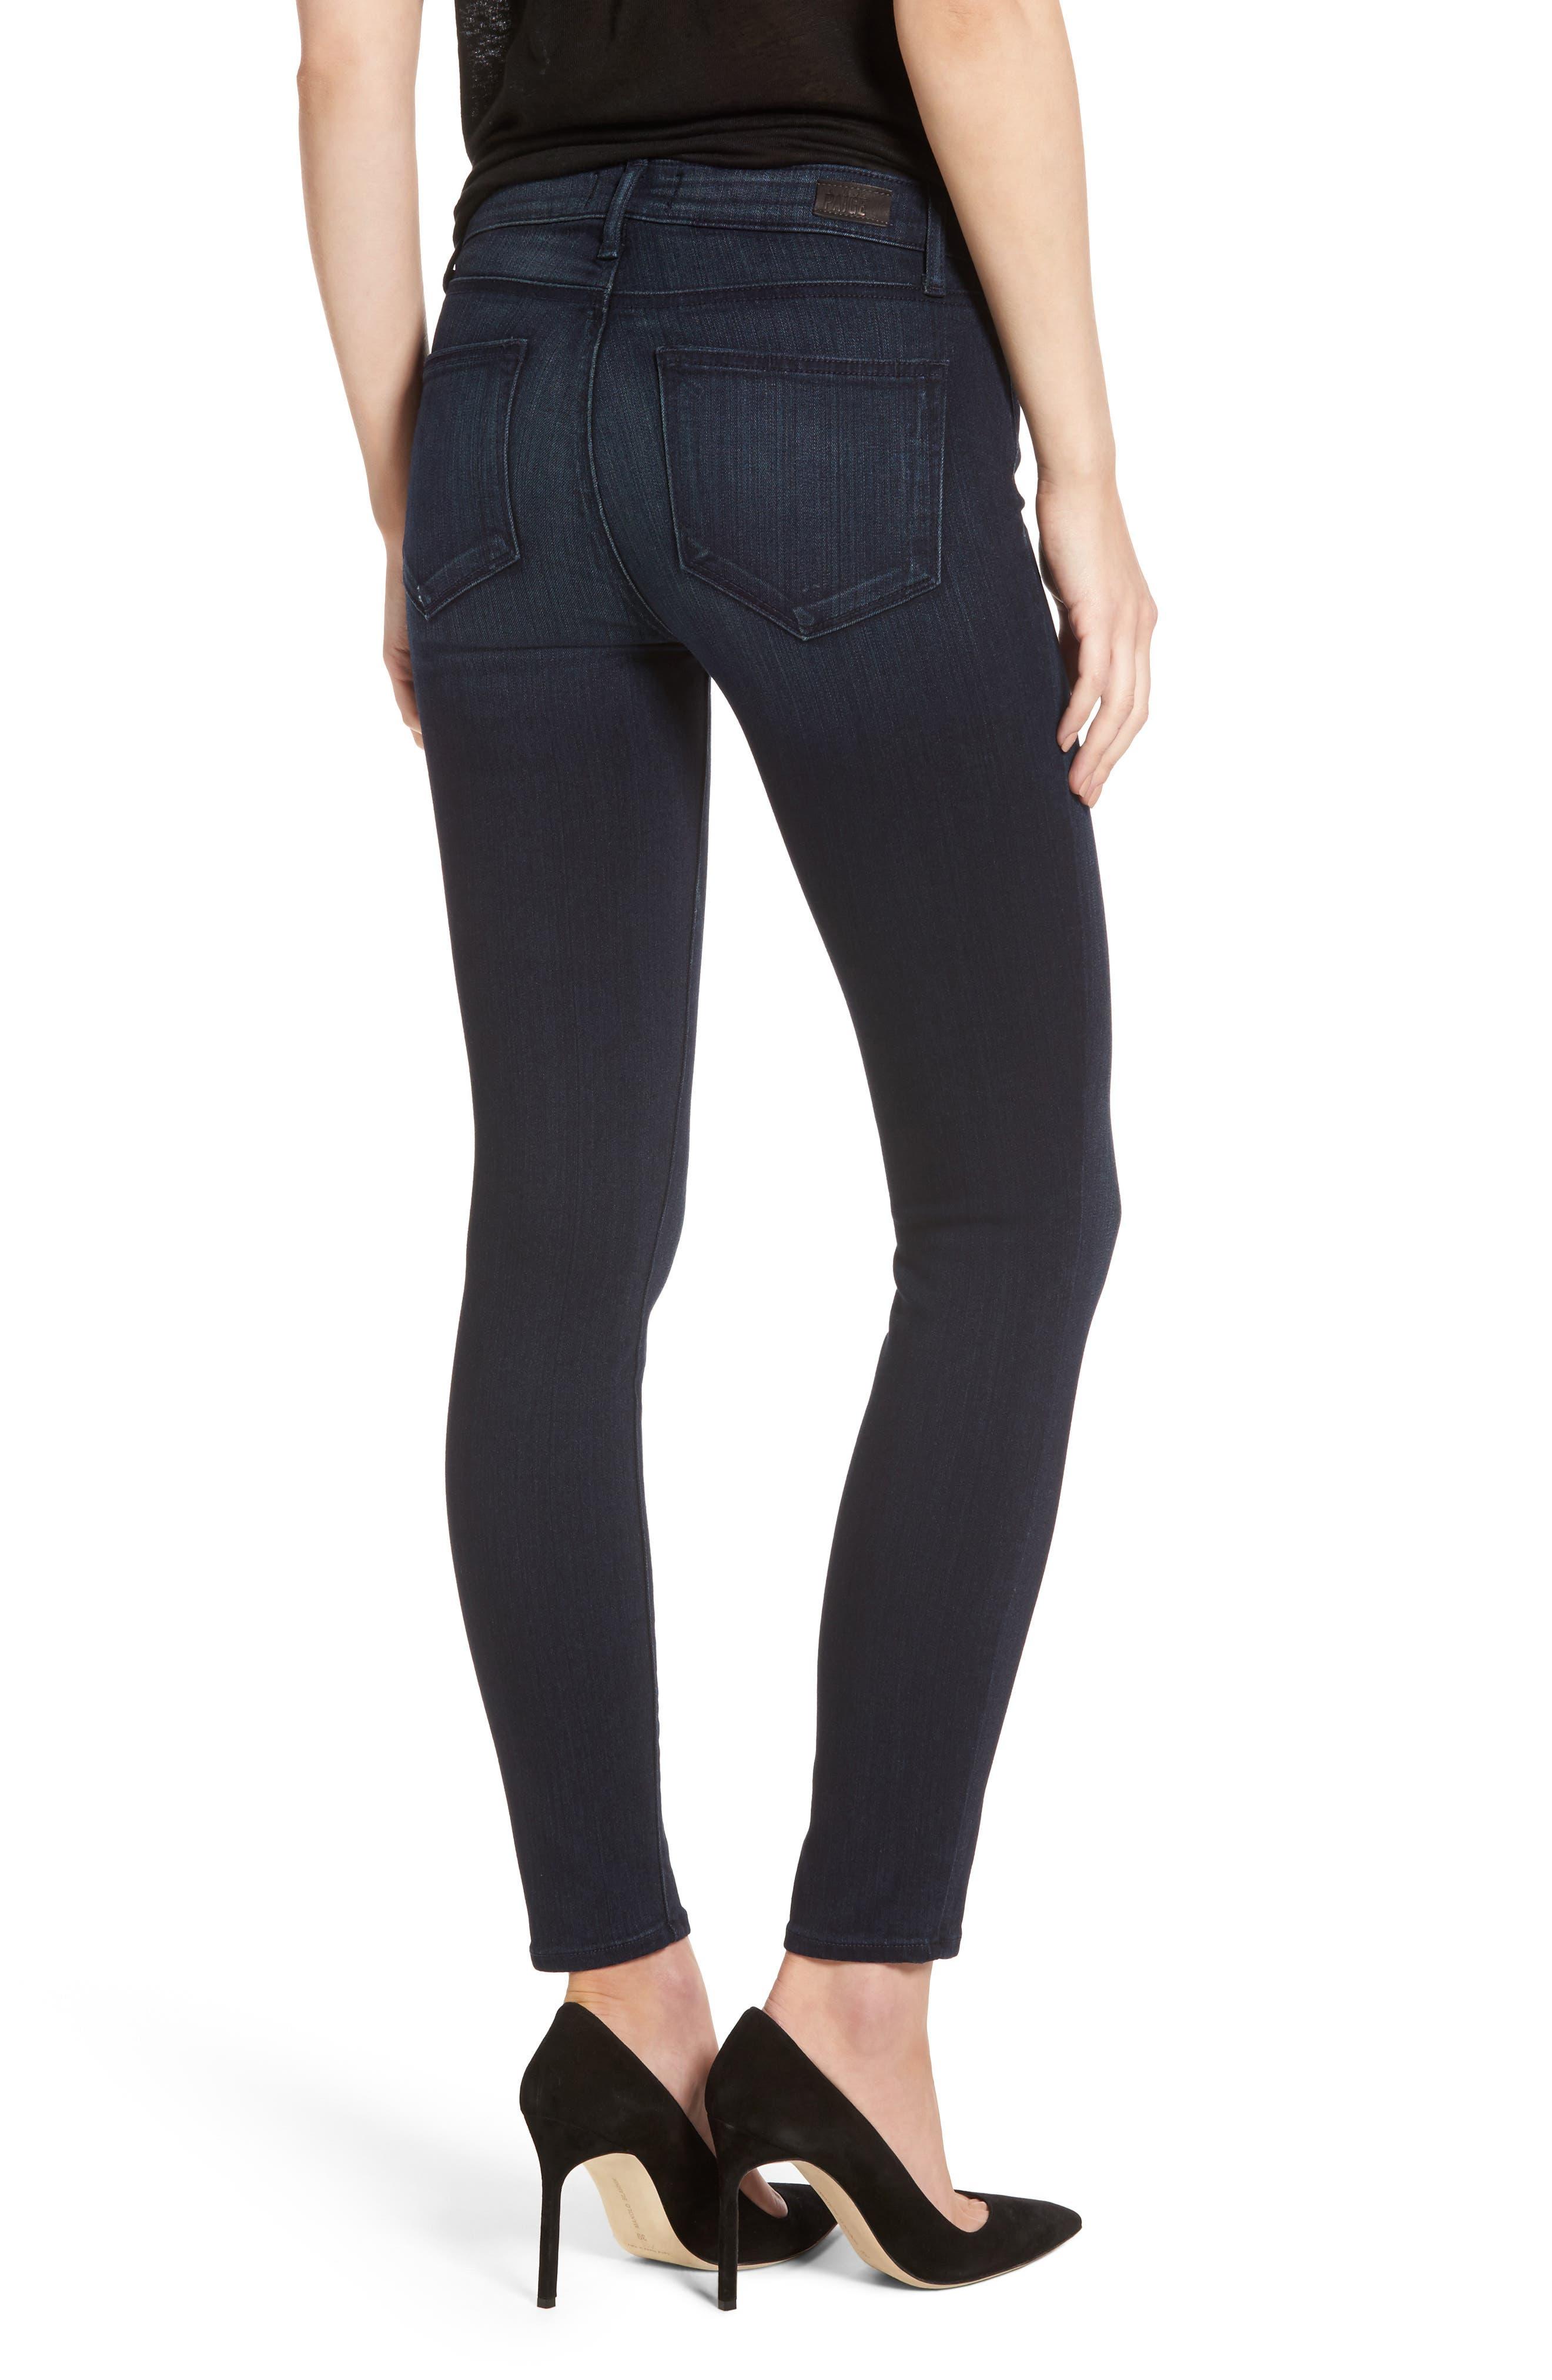 Transcend - Verdugo Ankle Skinny Jeans,                             Alternate thumbnail 2, color,                             Midlake